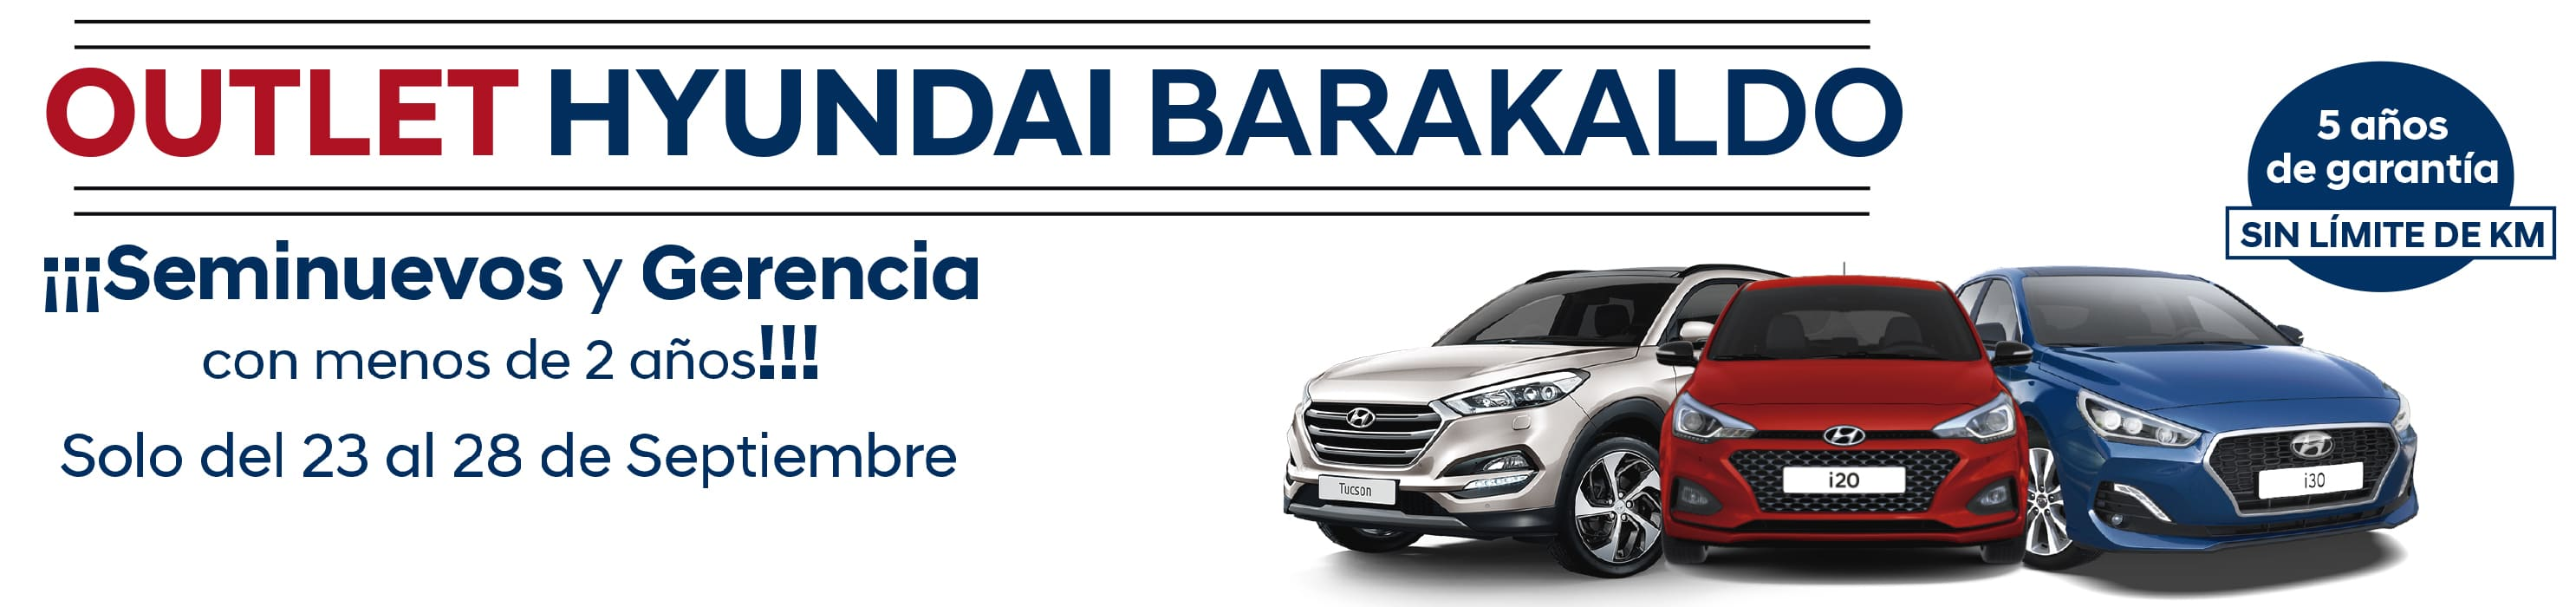 Oferta Outlet Hyundai Barakaldo